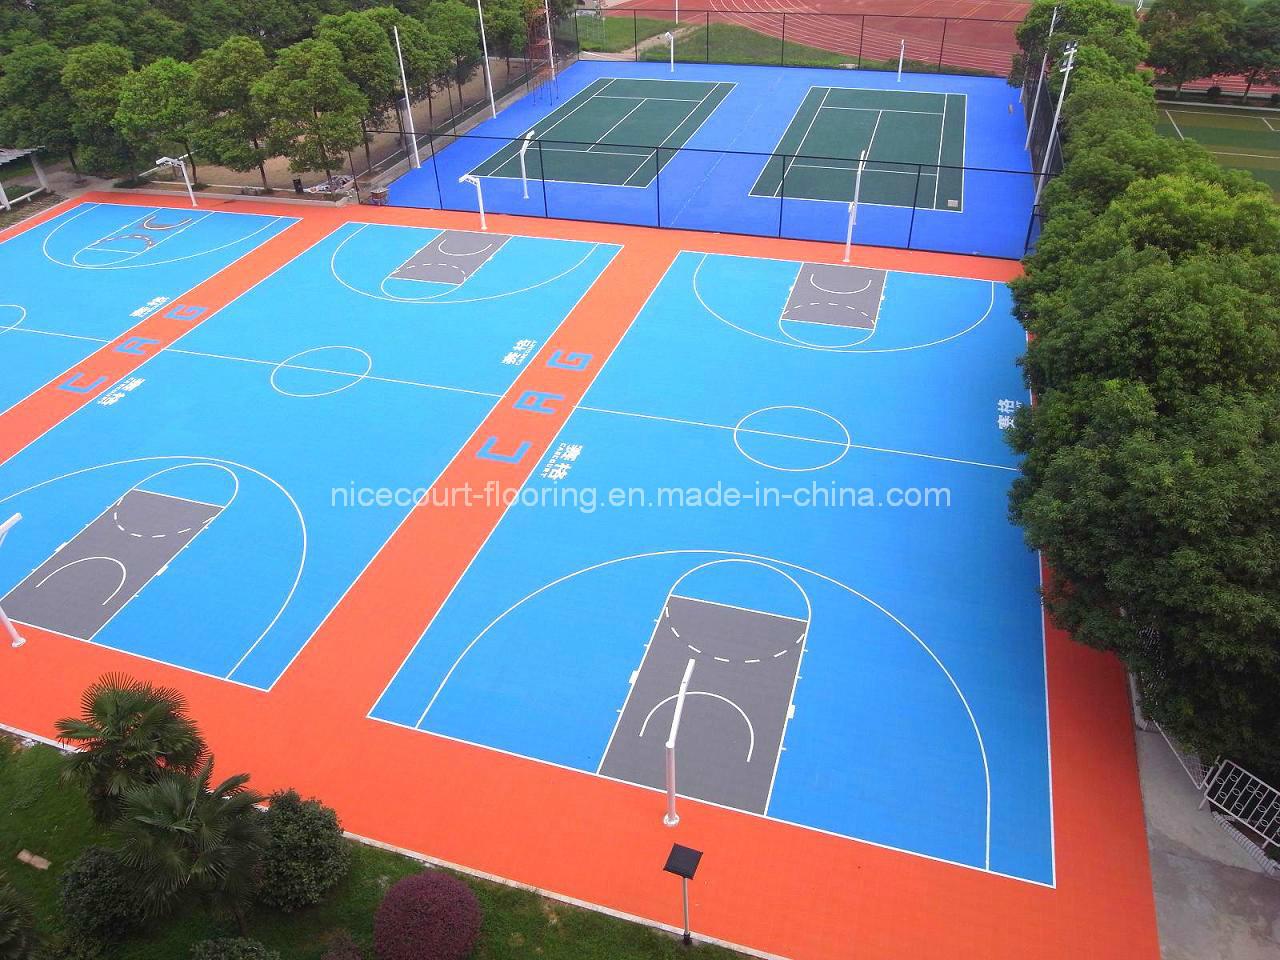 china interlocking porous outdoor basketball court flooring all